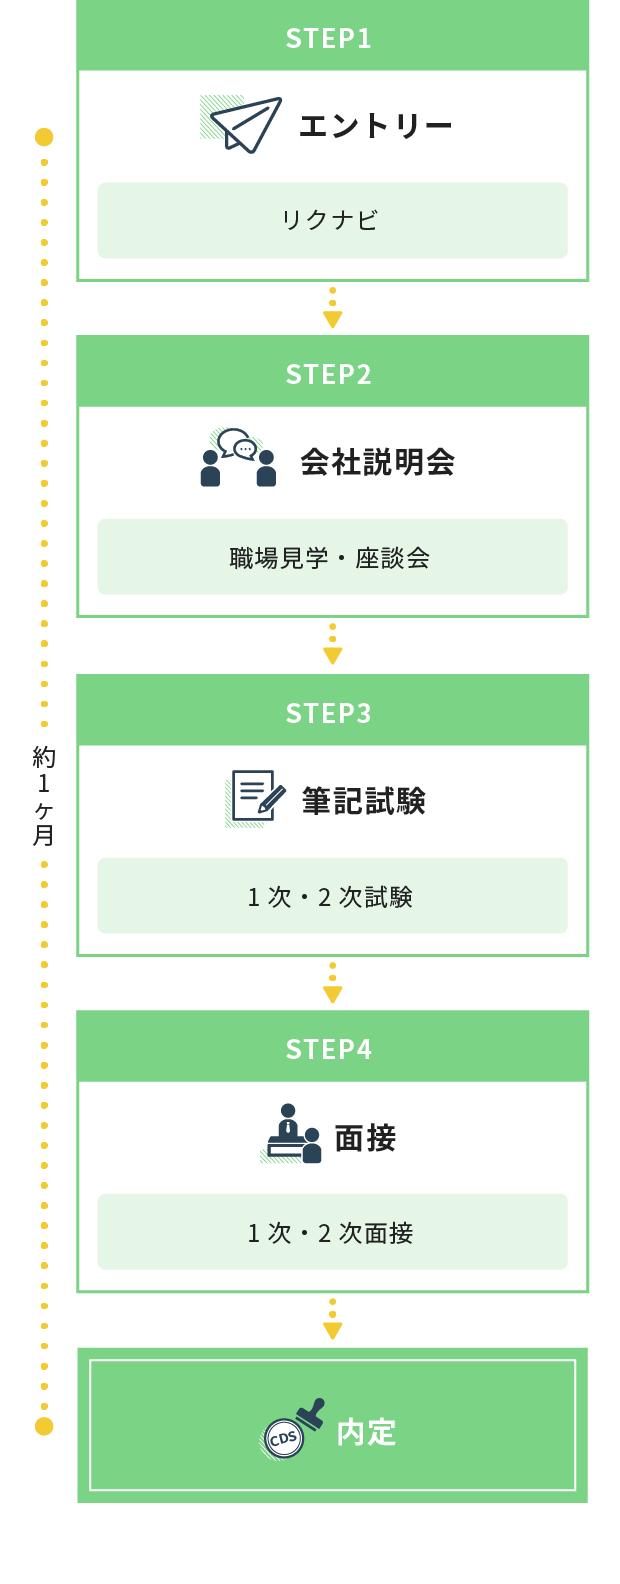 STEP1 エントリー(リクナビ)STEP2 会社説明会(職場見学・座談会)STEP3 筆記試験(1次・2次試験)STEP4 面接(1次・2次面接)→内定 約1か月